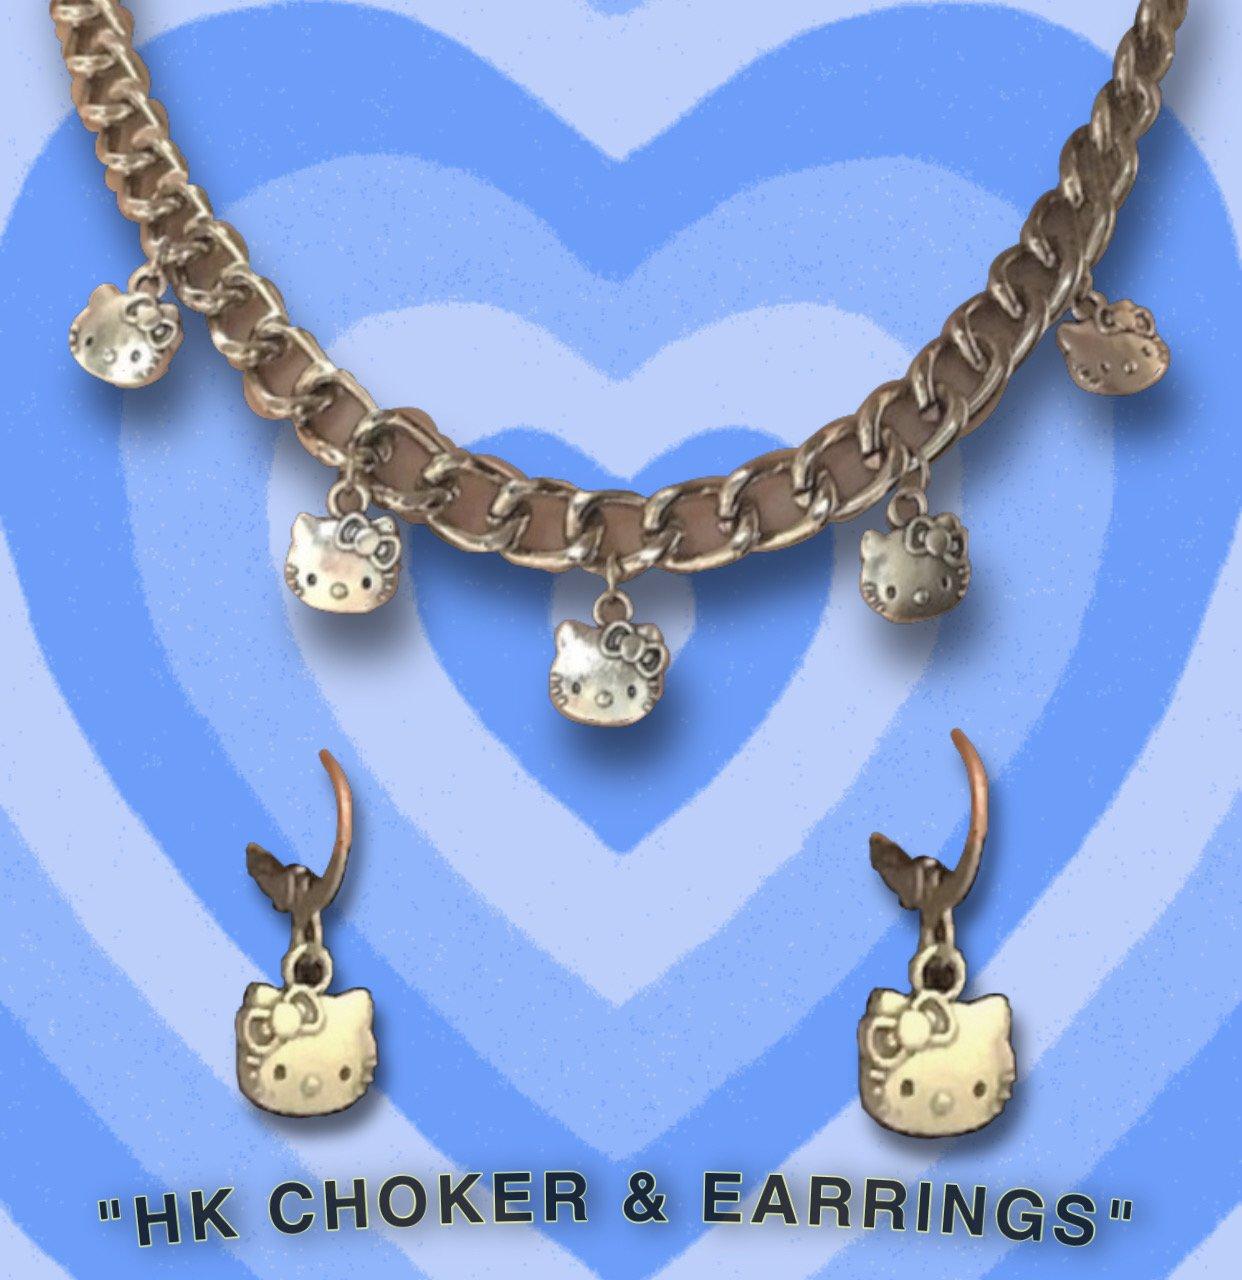 Image of HK Choker